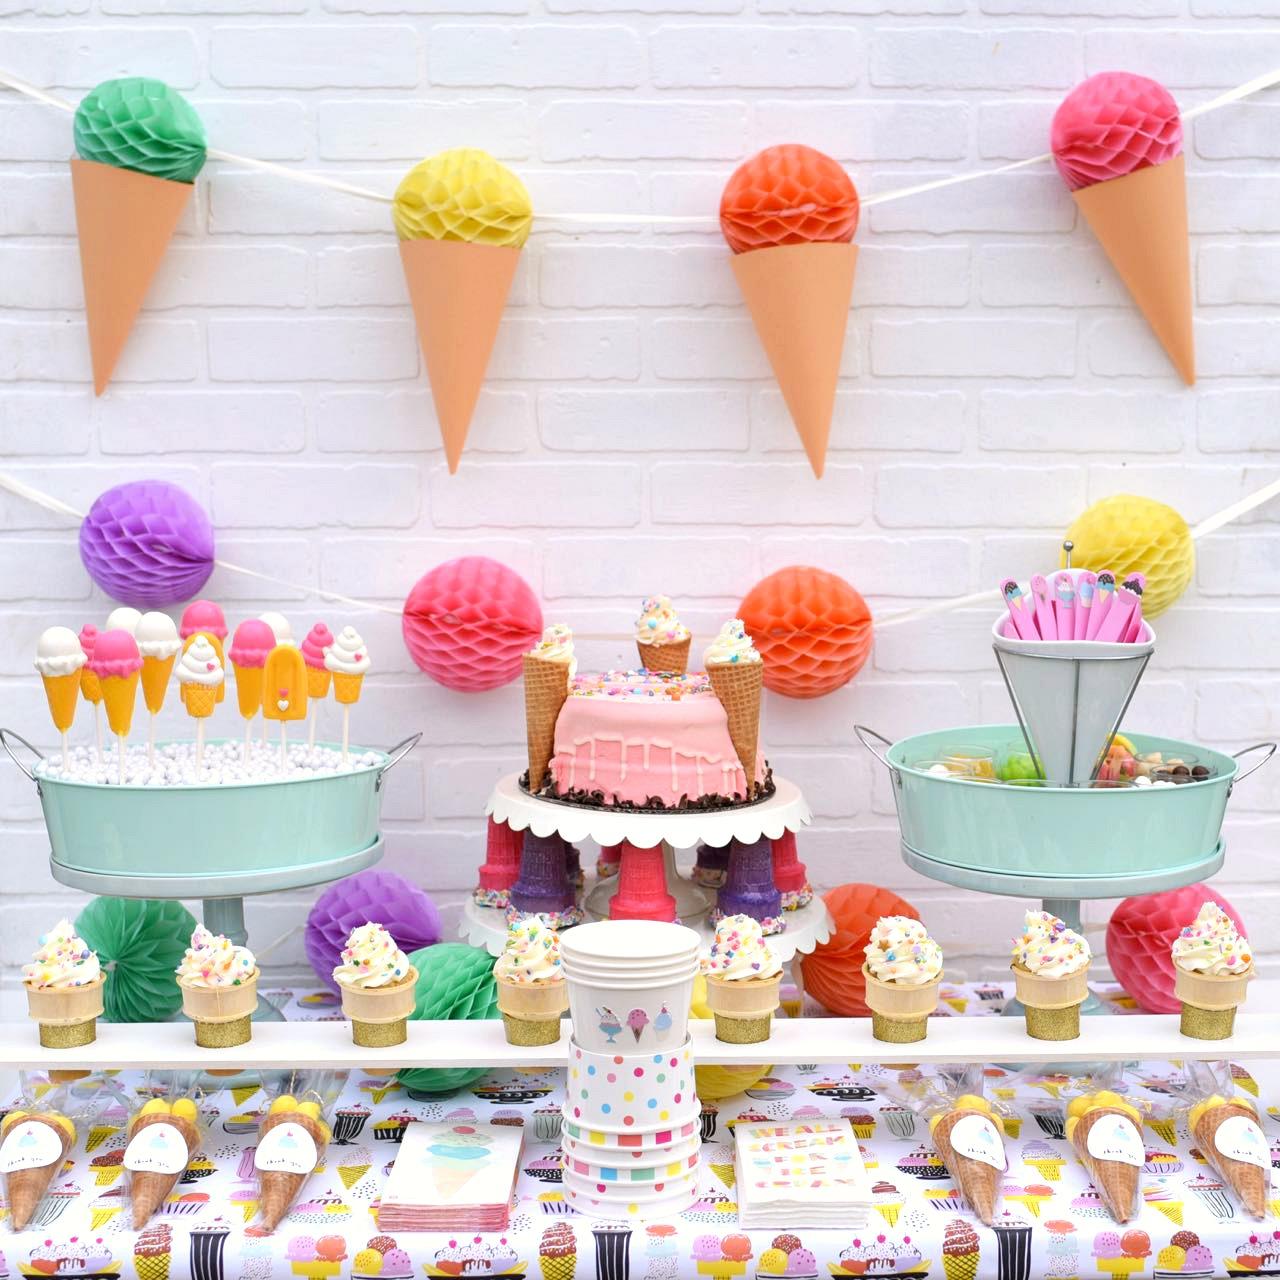 Ice-cream-party-for-tweens-2